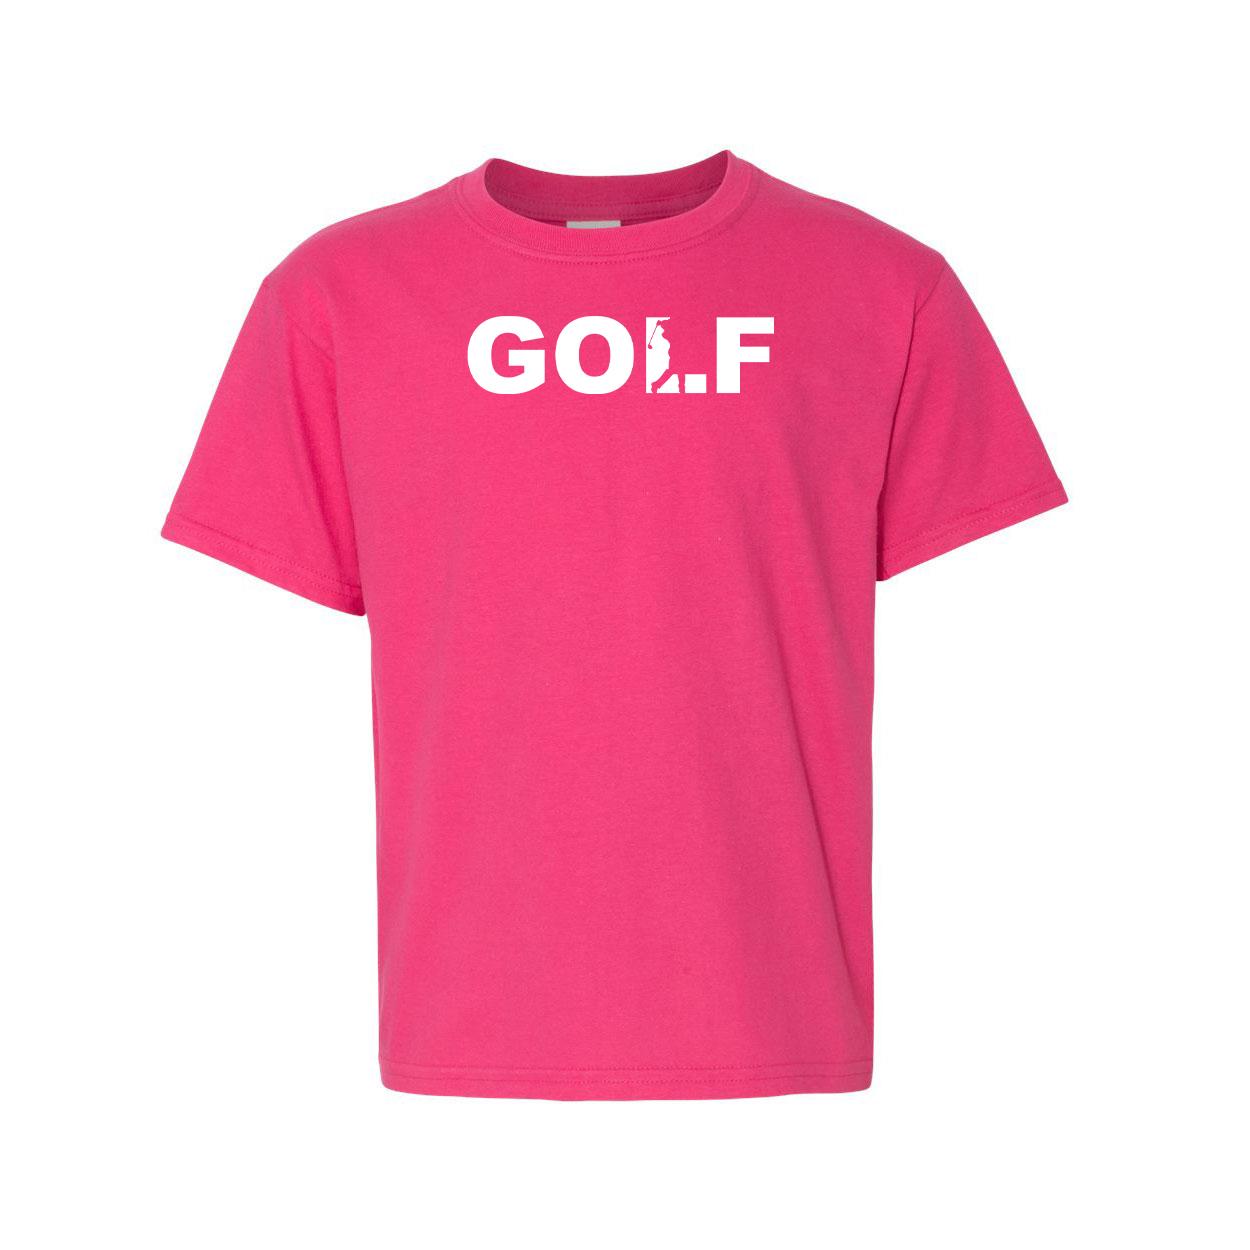 Golf Swing Logo Night Out Youth T-Shirt Pink (White Logo)